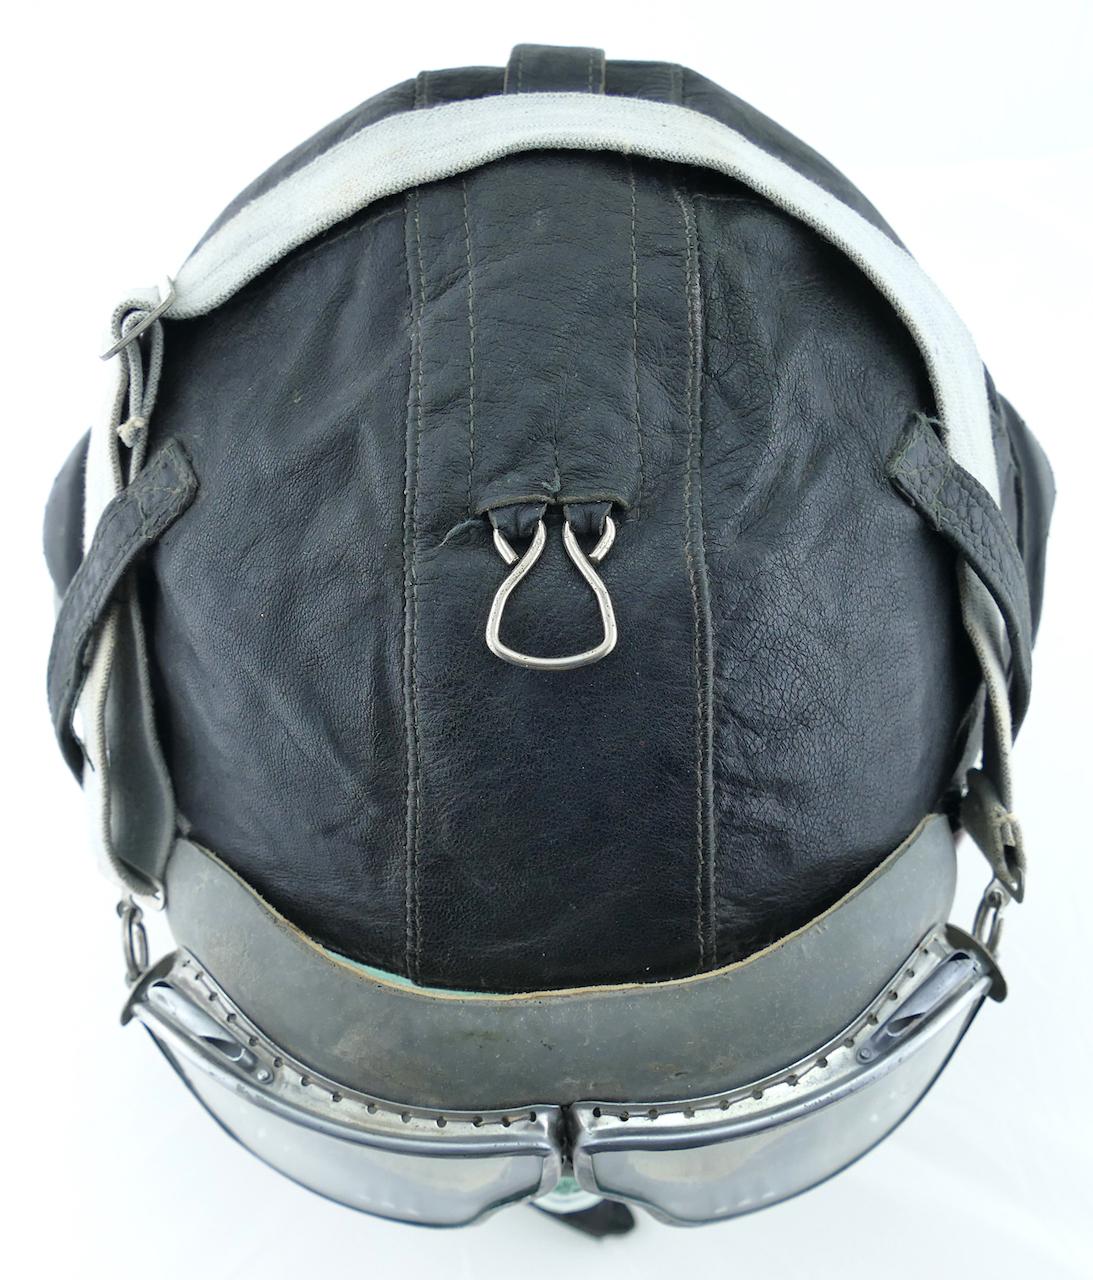 soviet_WWII_leather_flight_helmet_with_goggles_6.jpg